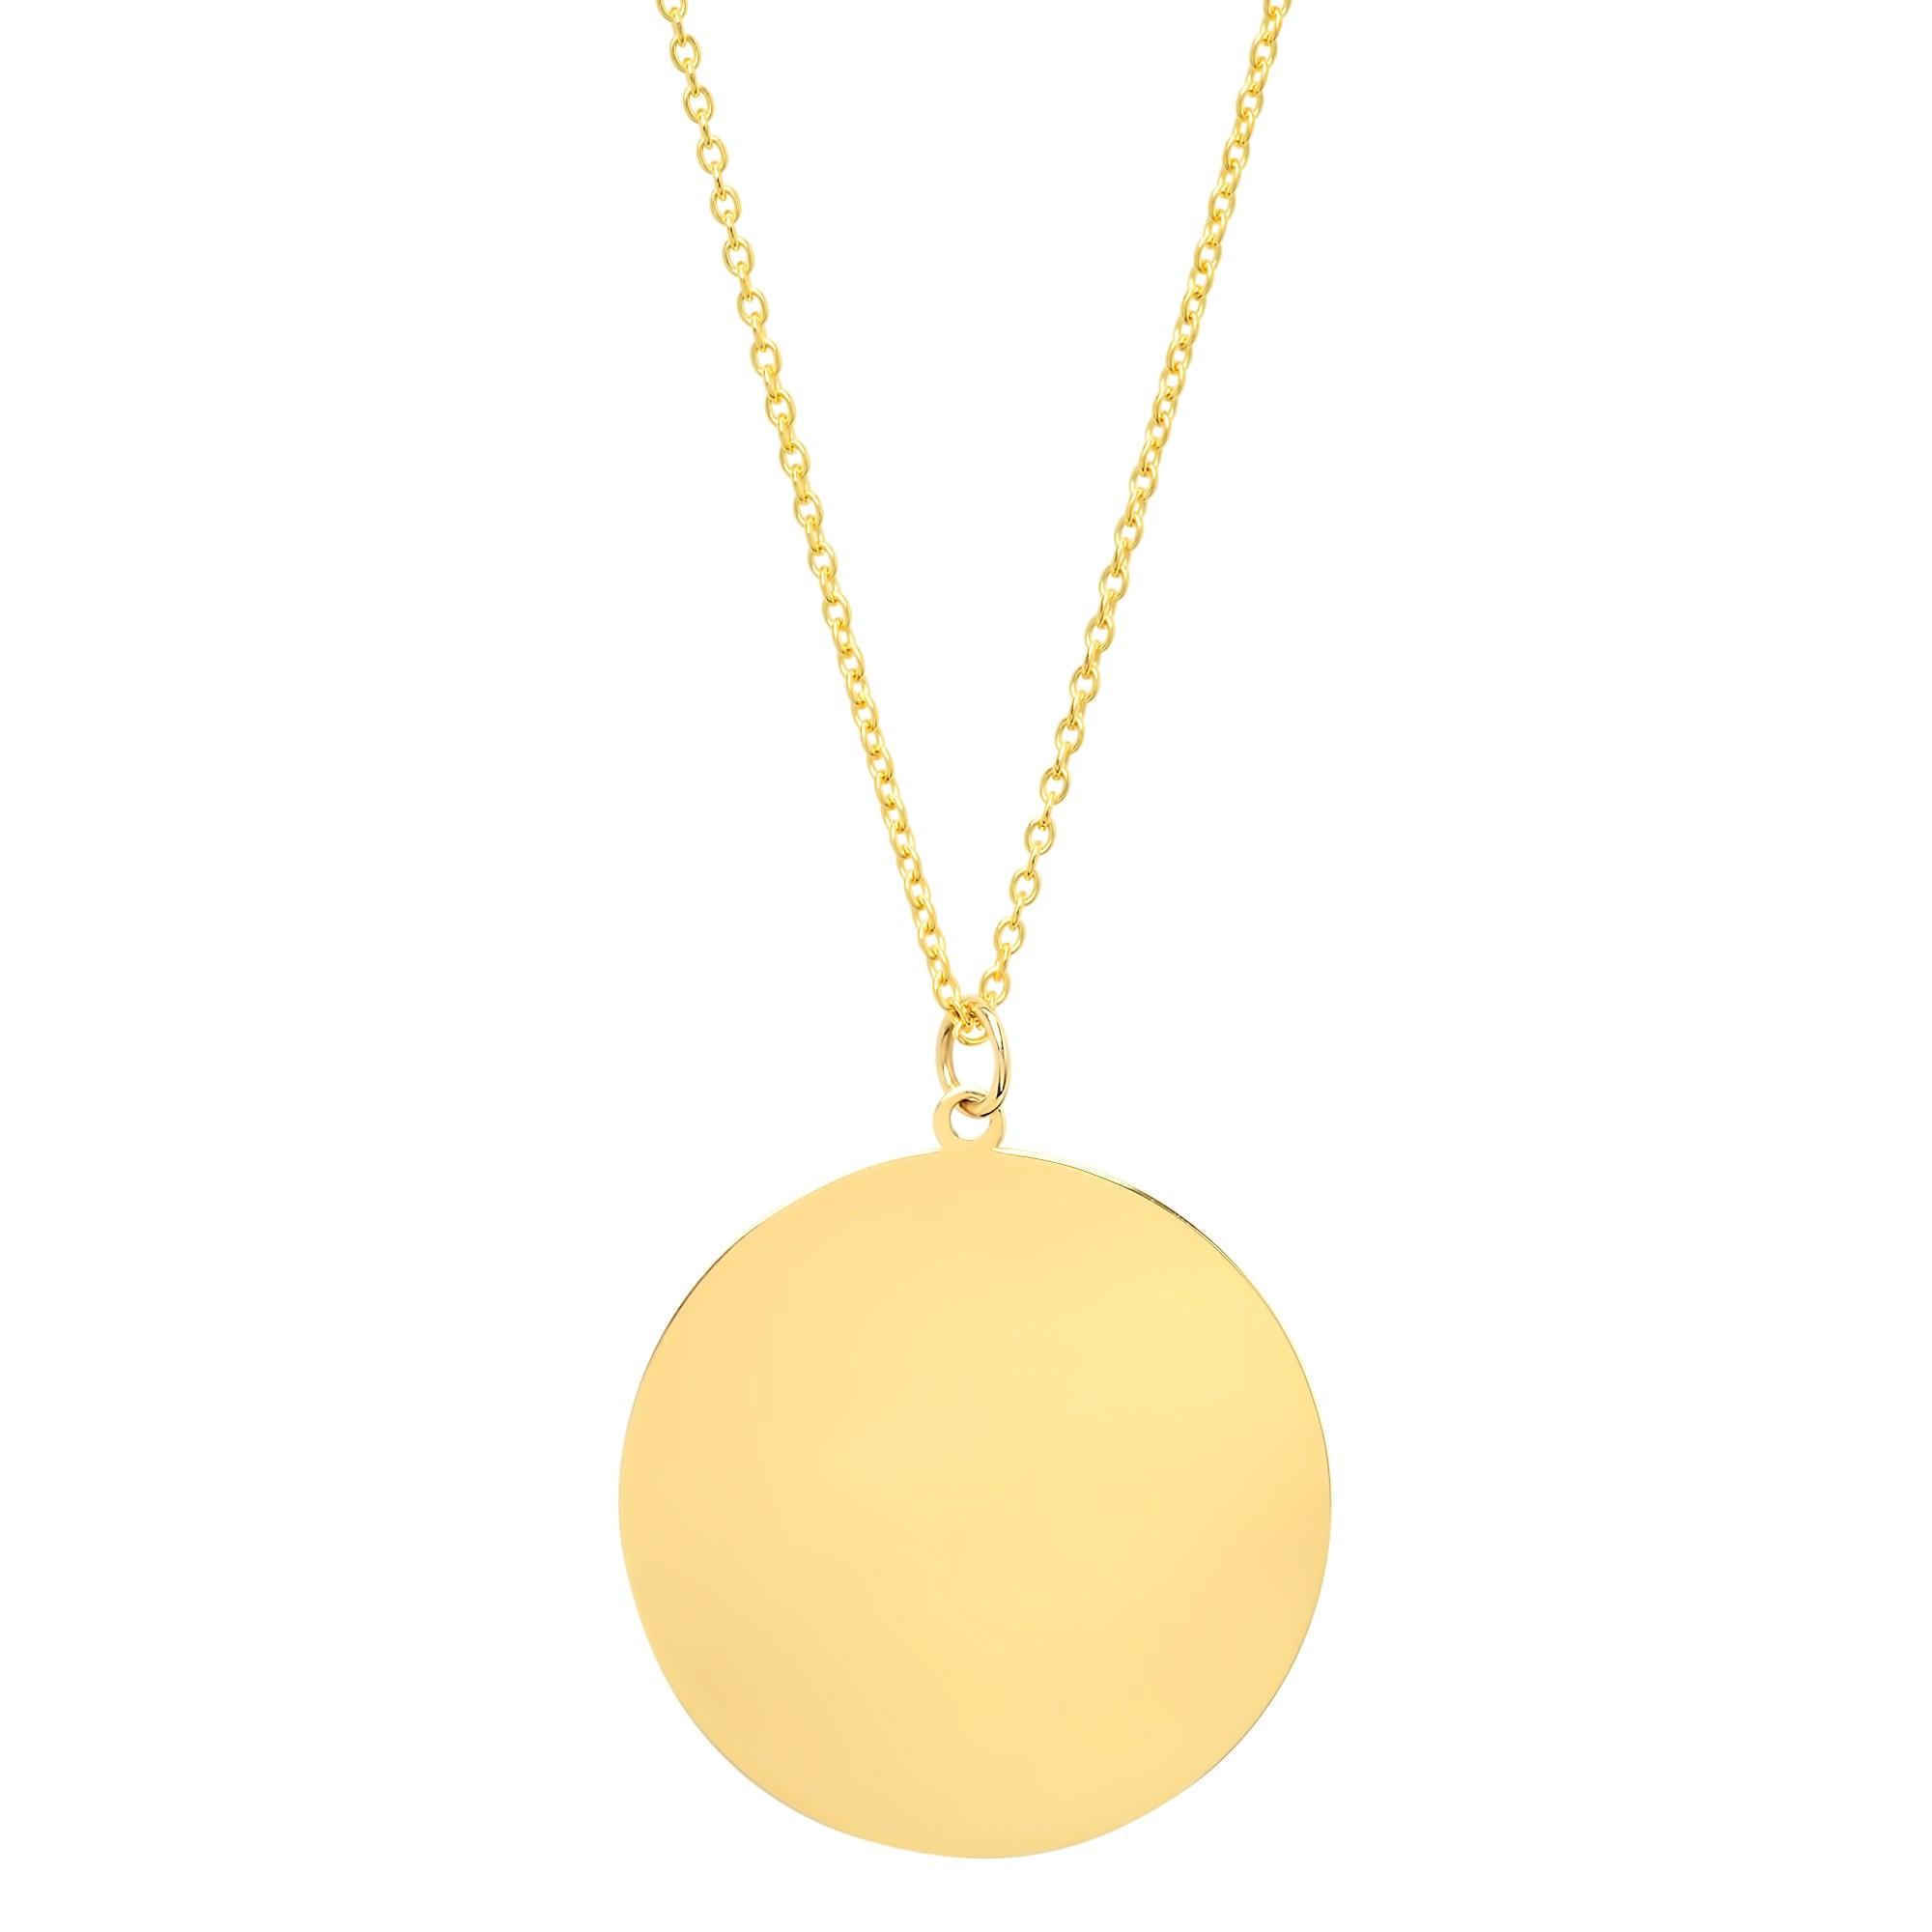 14k Yellow Gold Jumbo Disc Necklace